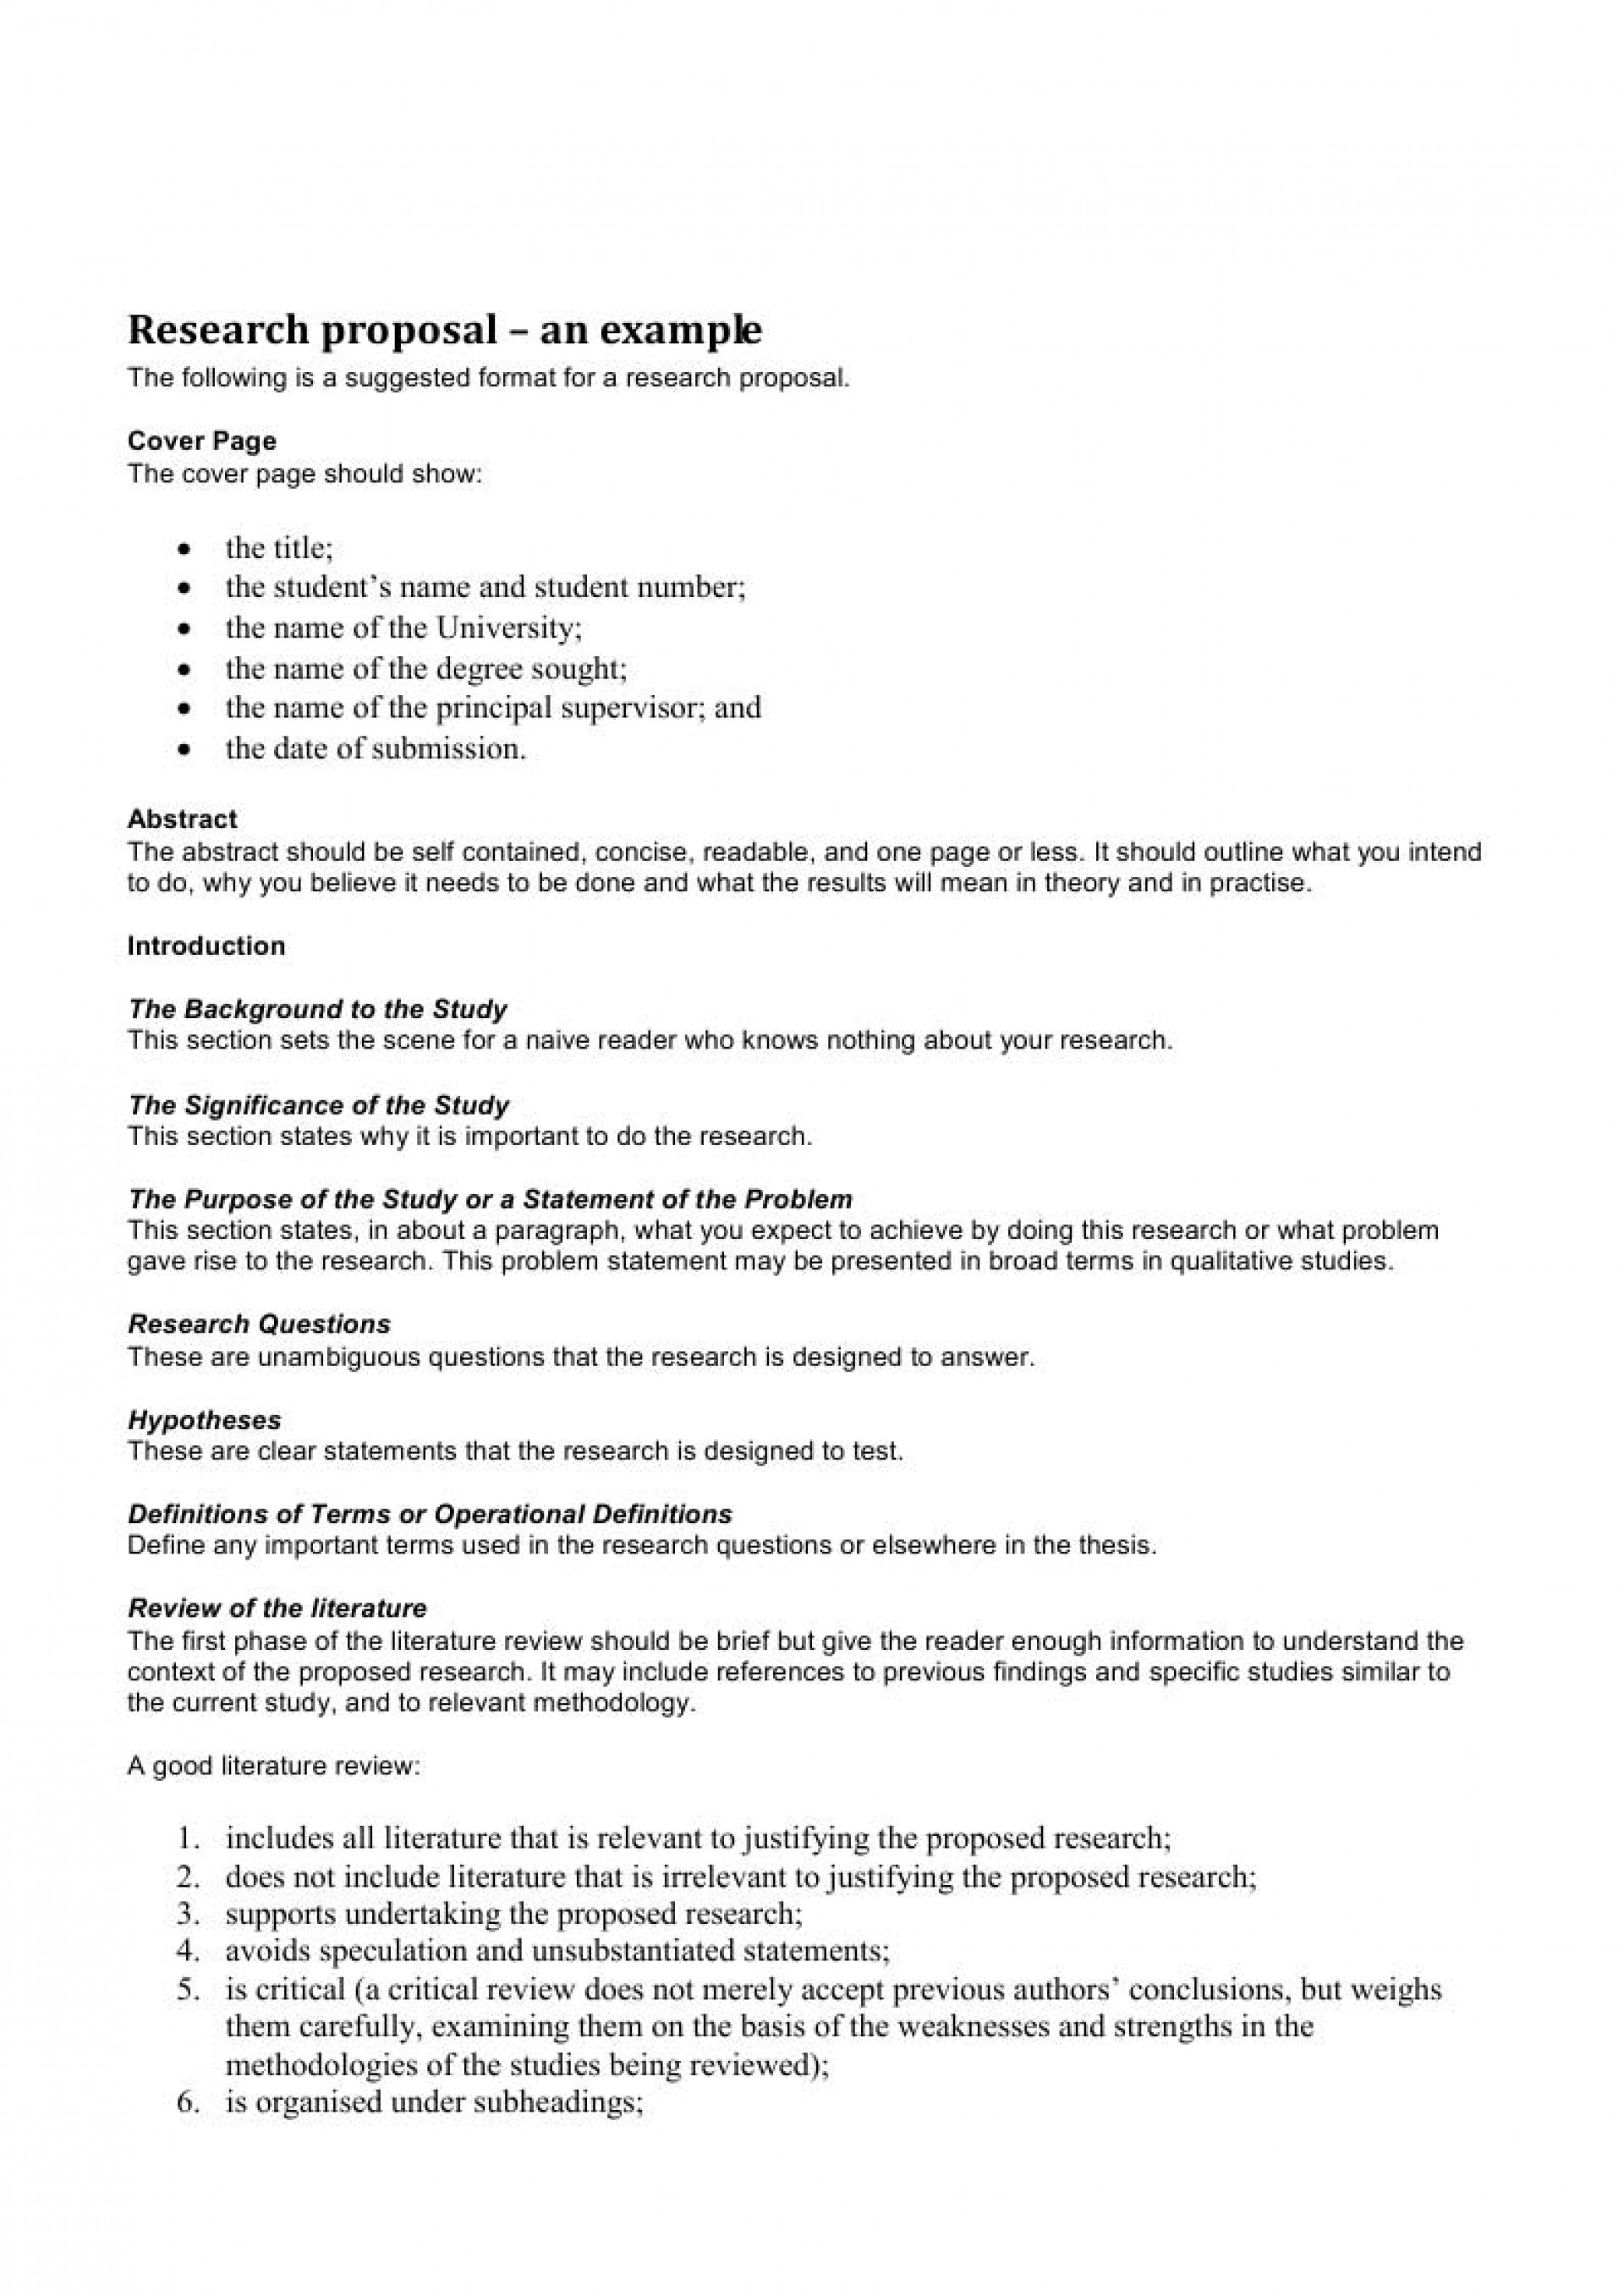 004 Essay Example Lemon Clot Research Proposal Unusual Reddit Bbc 1920